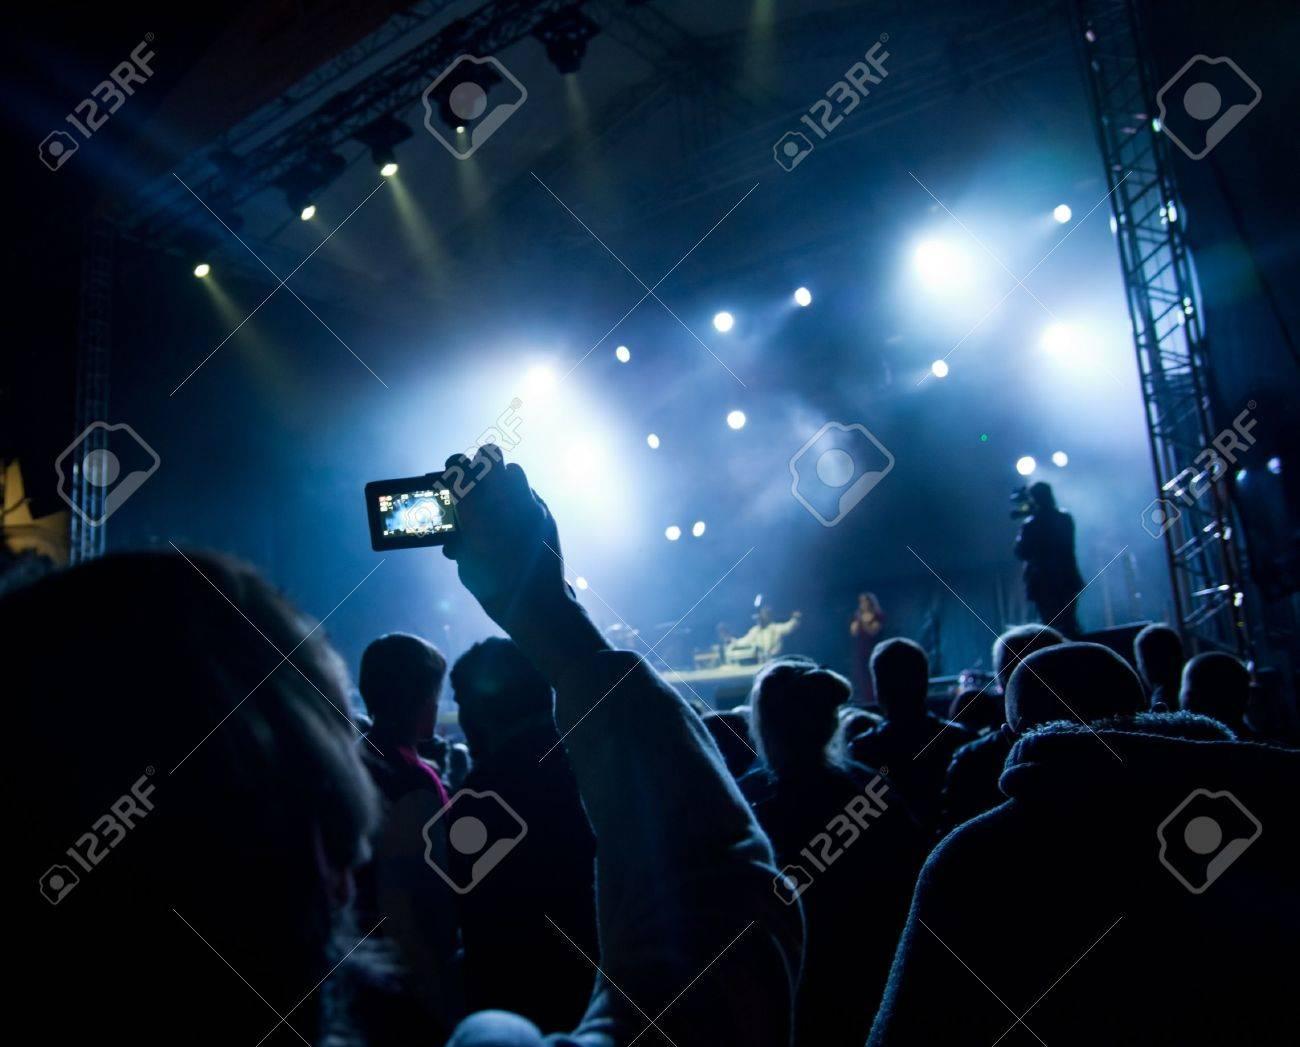 Empty outdoor rock stage - Outdoor Concert Stage People Watching Open Air Concert Stock Photo